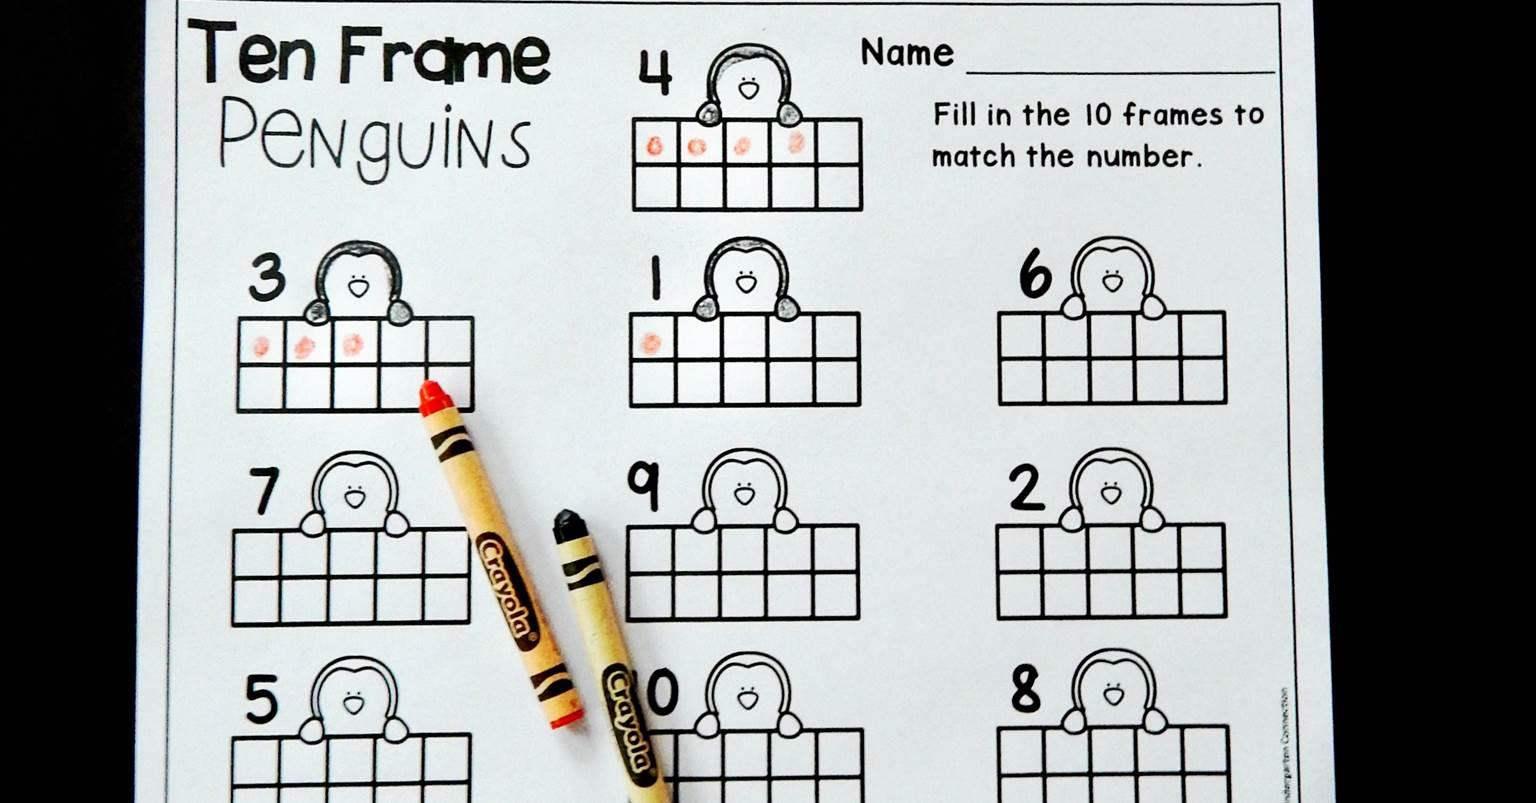 Penguin Ten Frame Counting Worksheet Kindergarten Winter